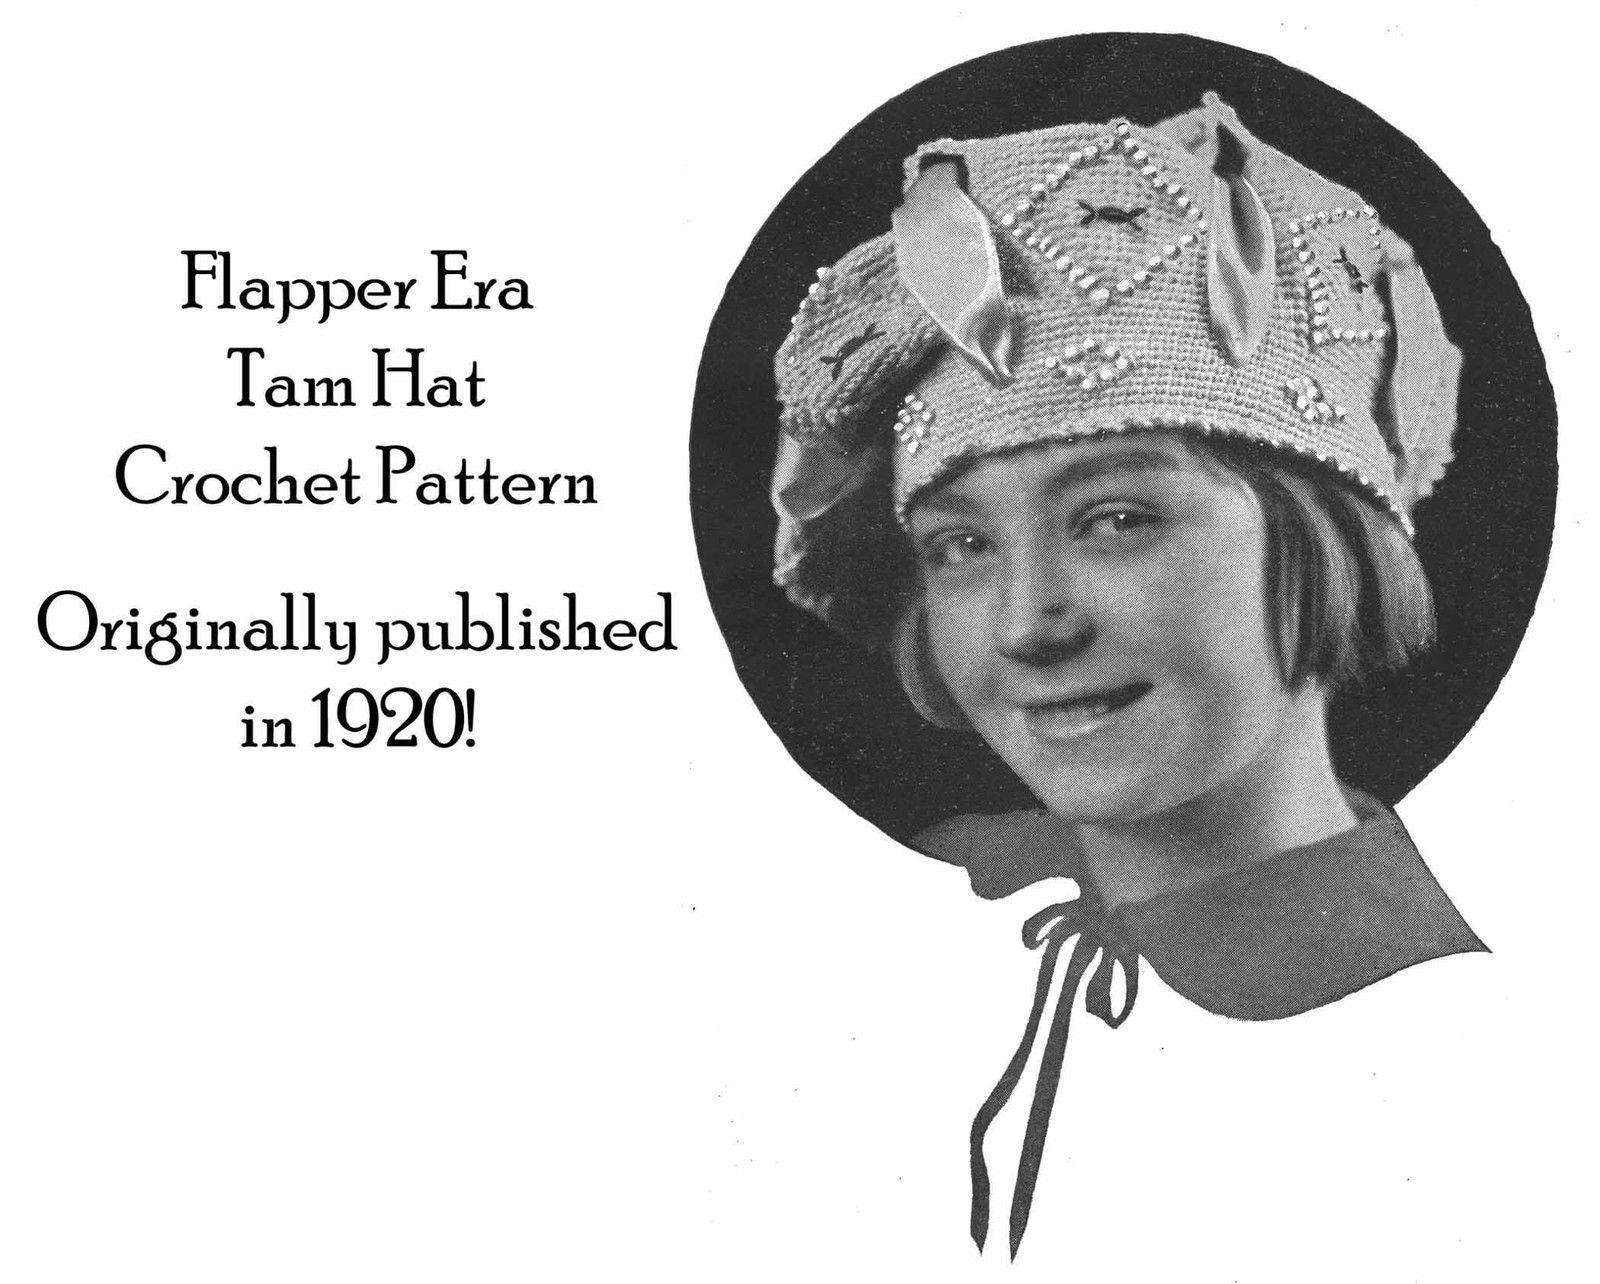 1920 Flapper Tam Hat Crochet Pattern Prohibition Fashion DIY Roaring 20s DIY 1